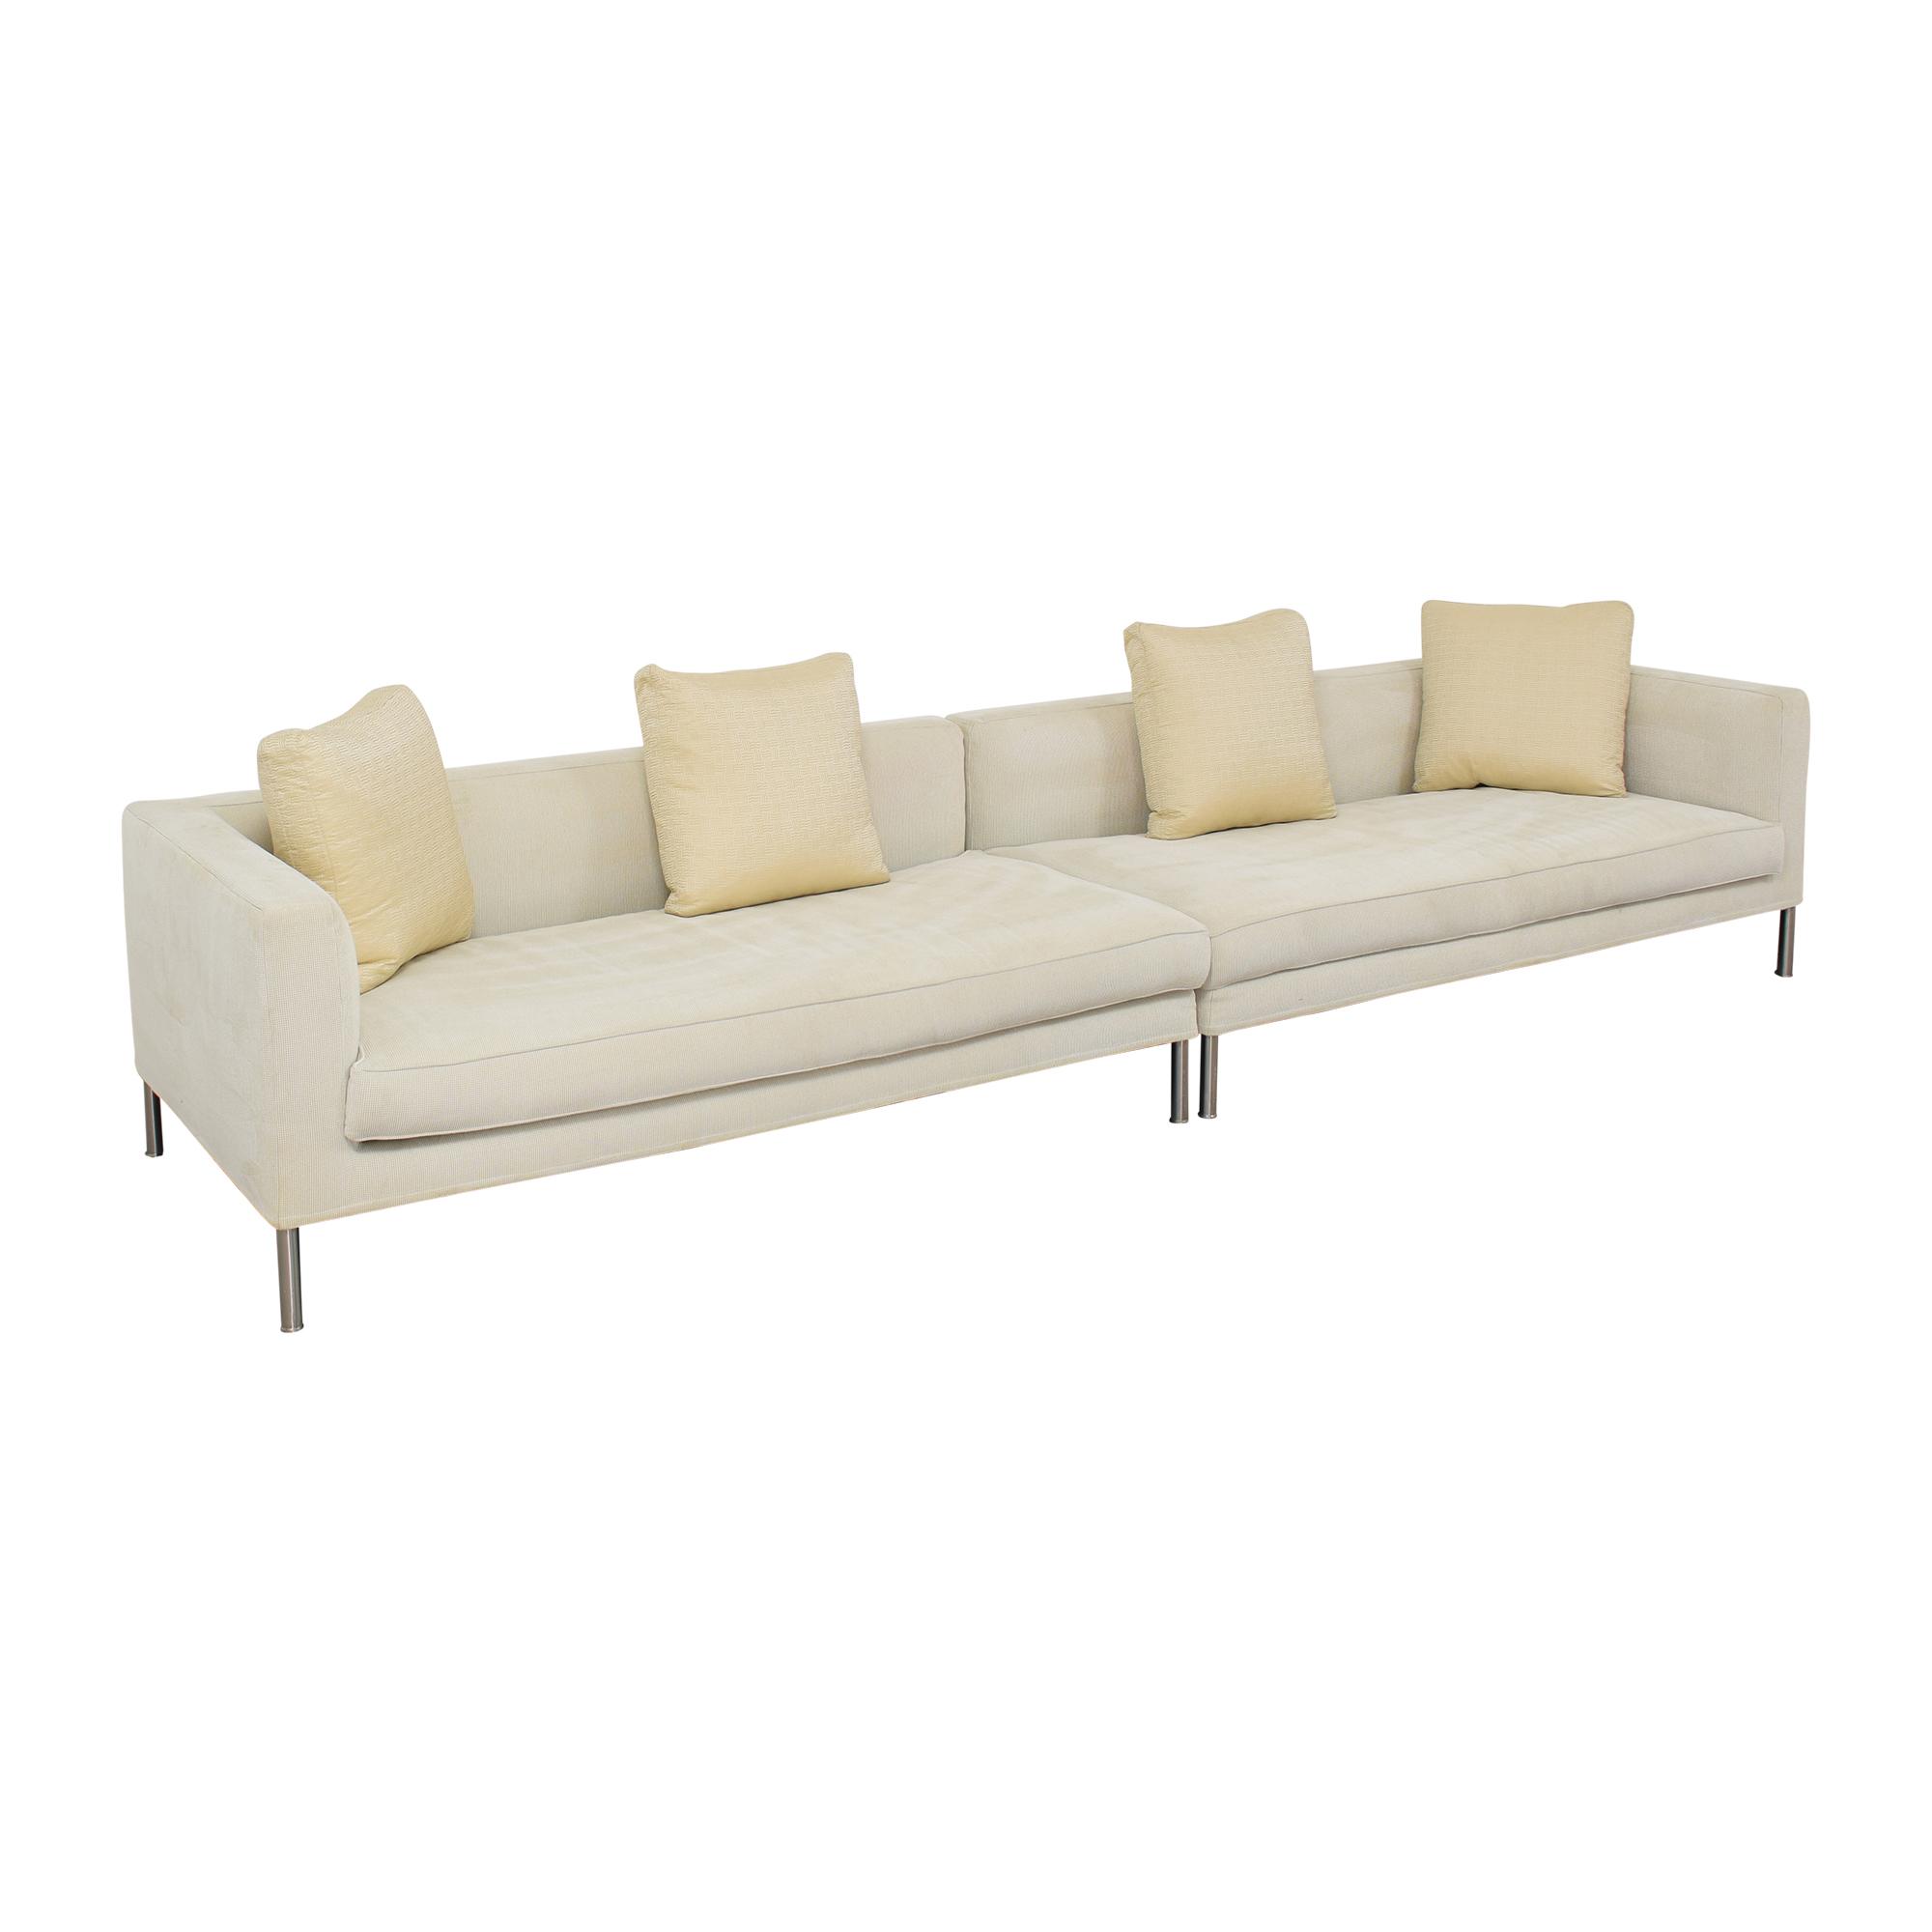 Frigerio Frigerio Modern Two Piece Sectional Sofa pa